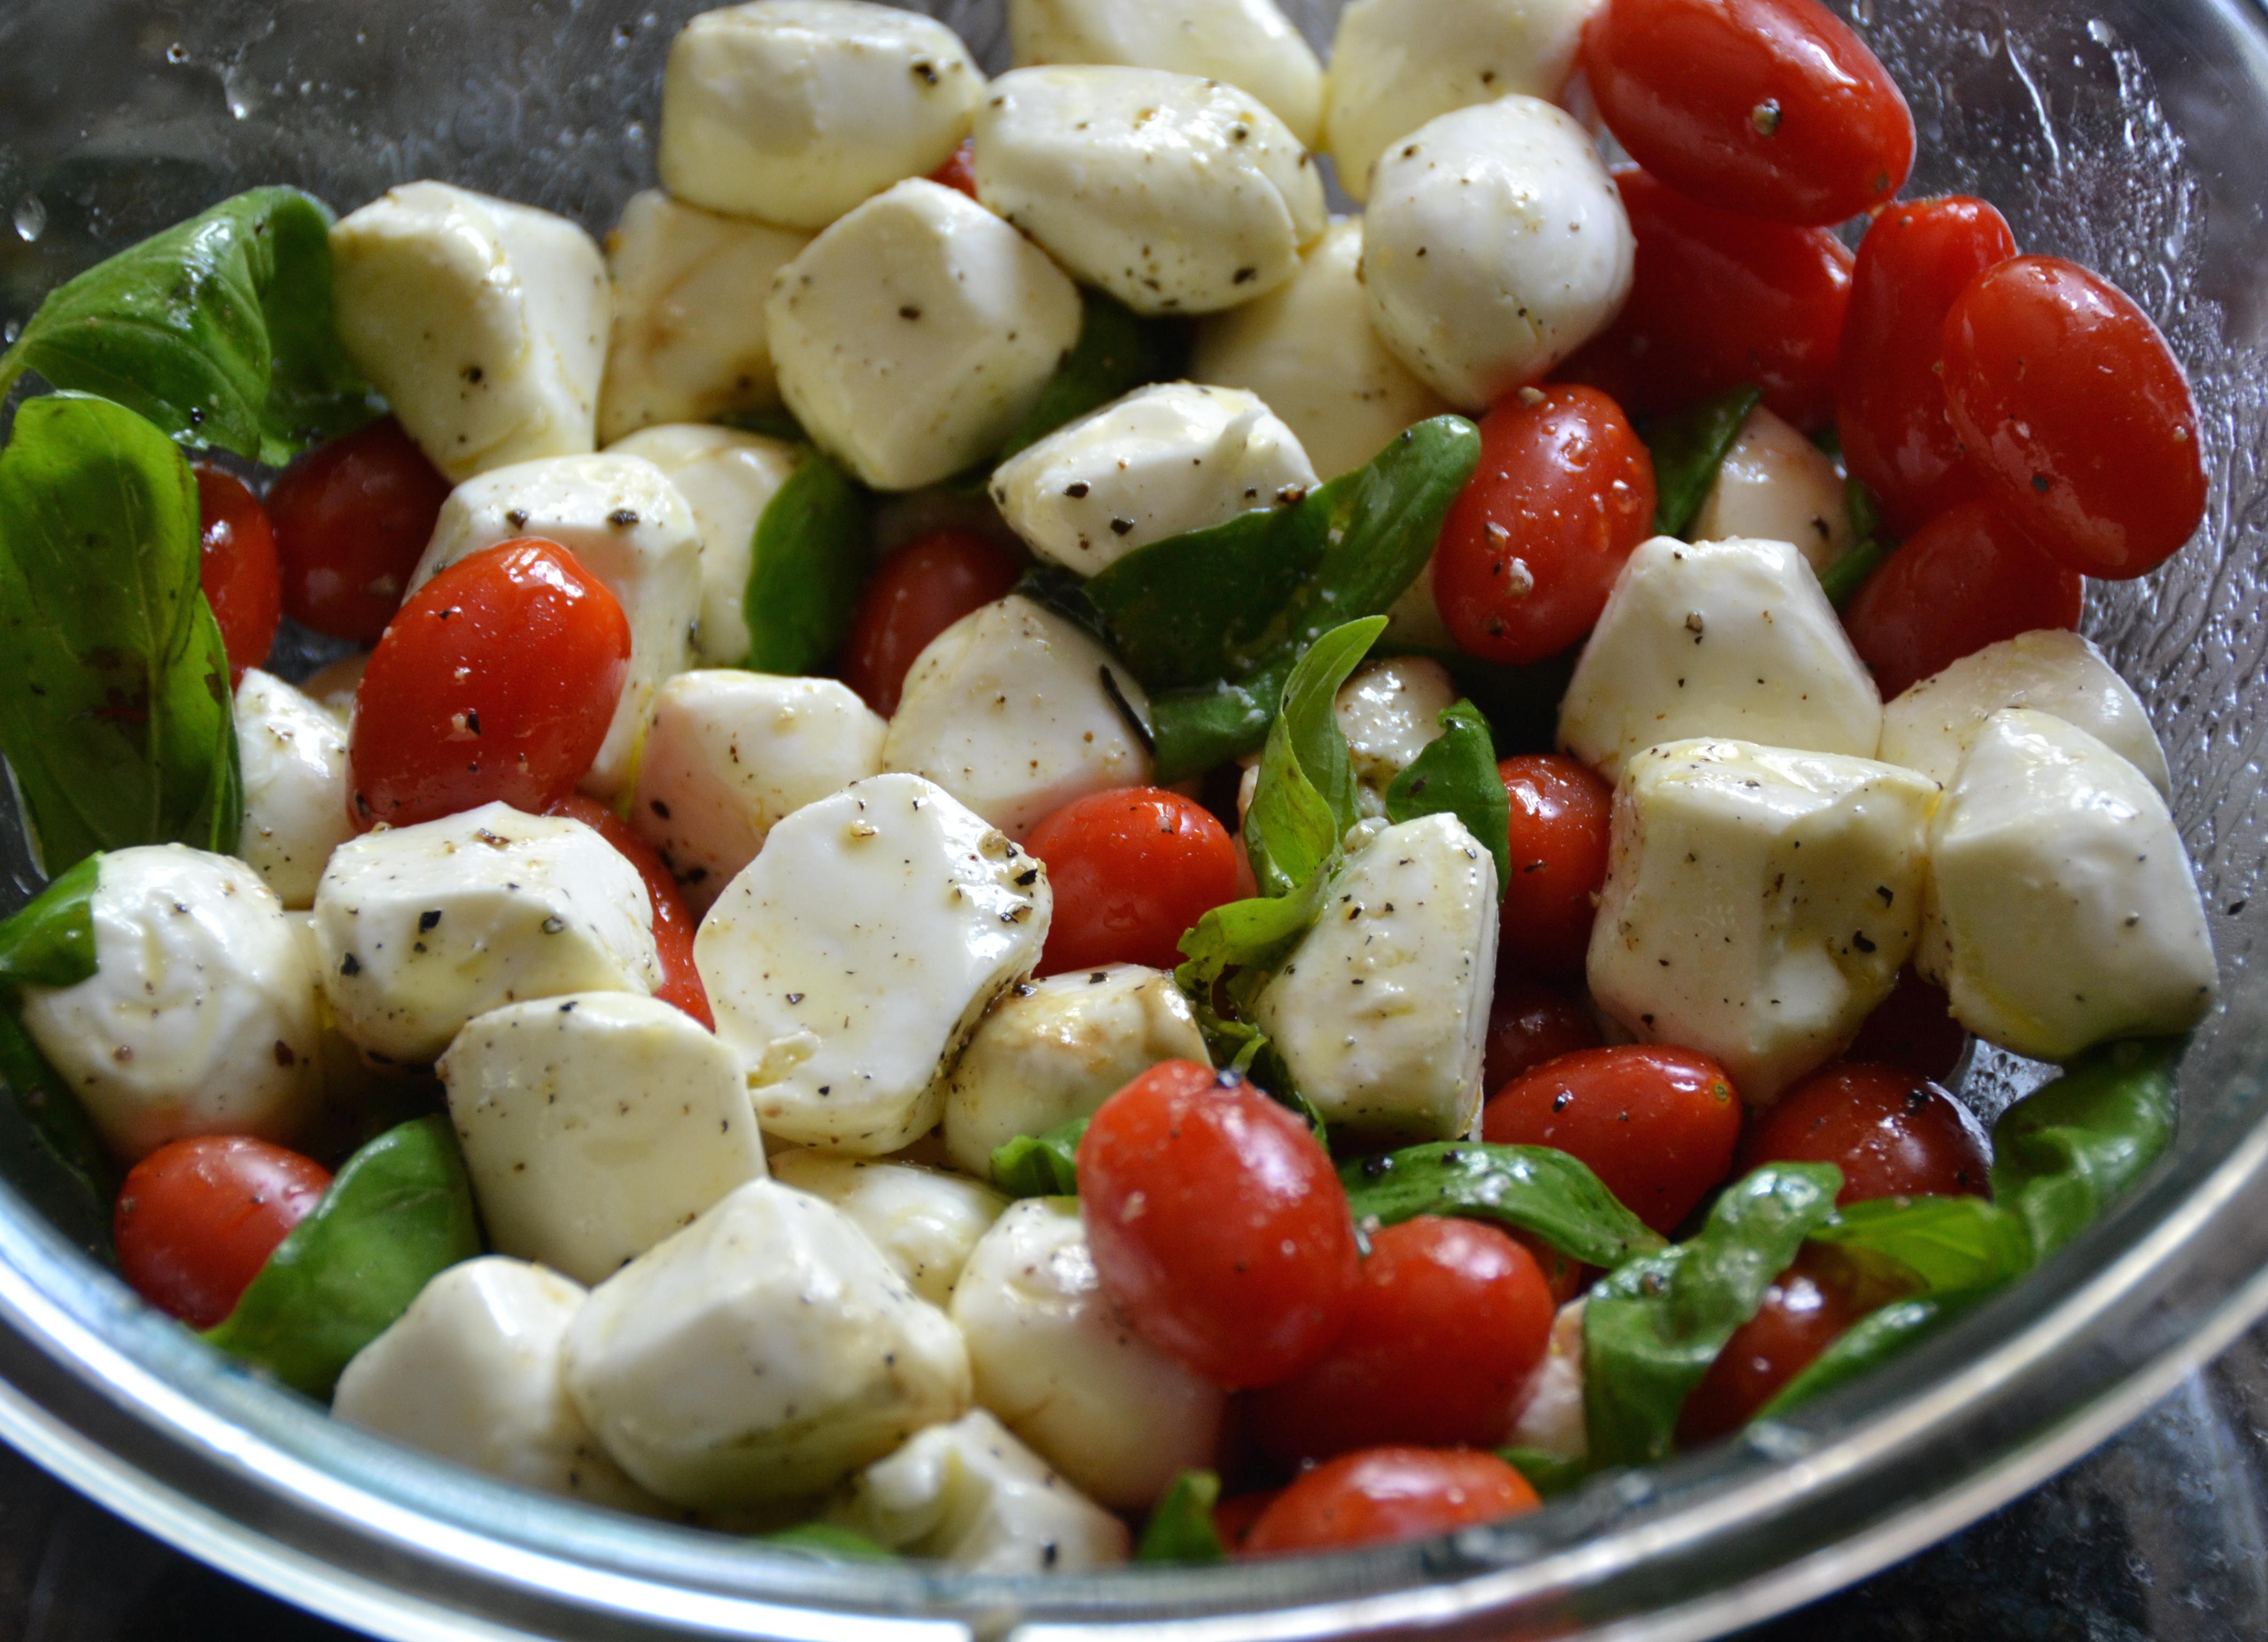 ... cheese salad warm shrimp and blue cheese pasta salad recipe yummly